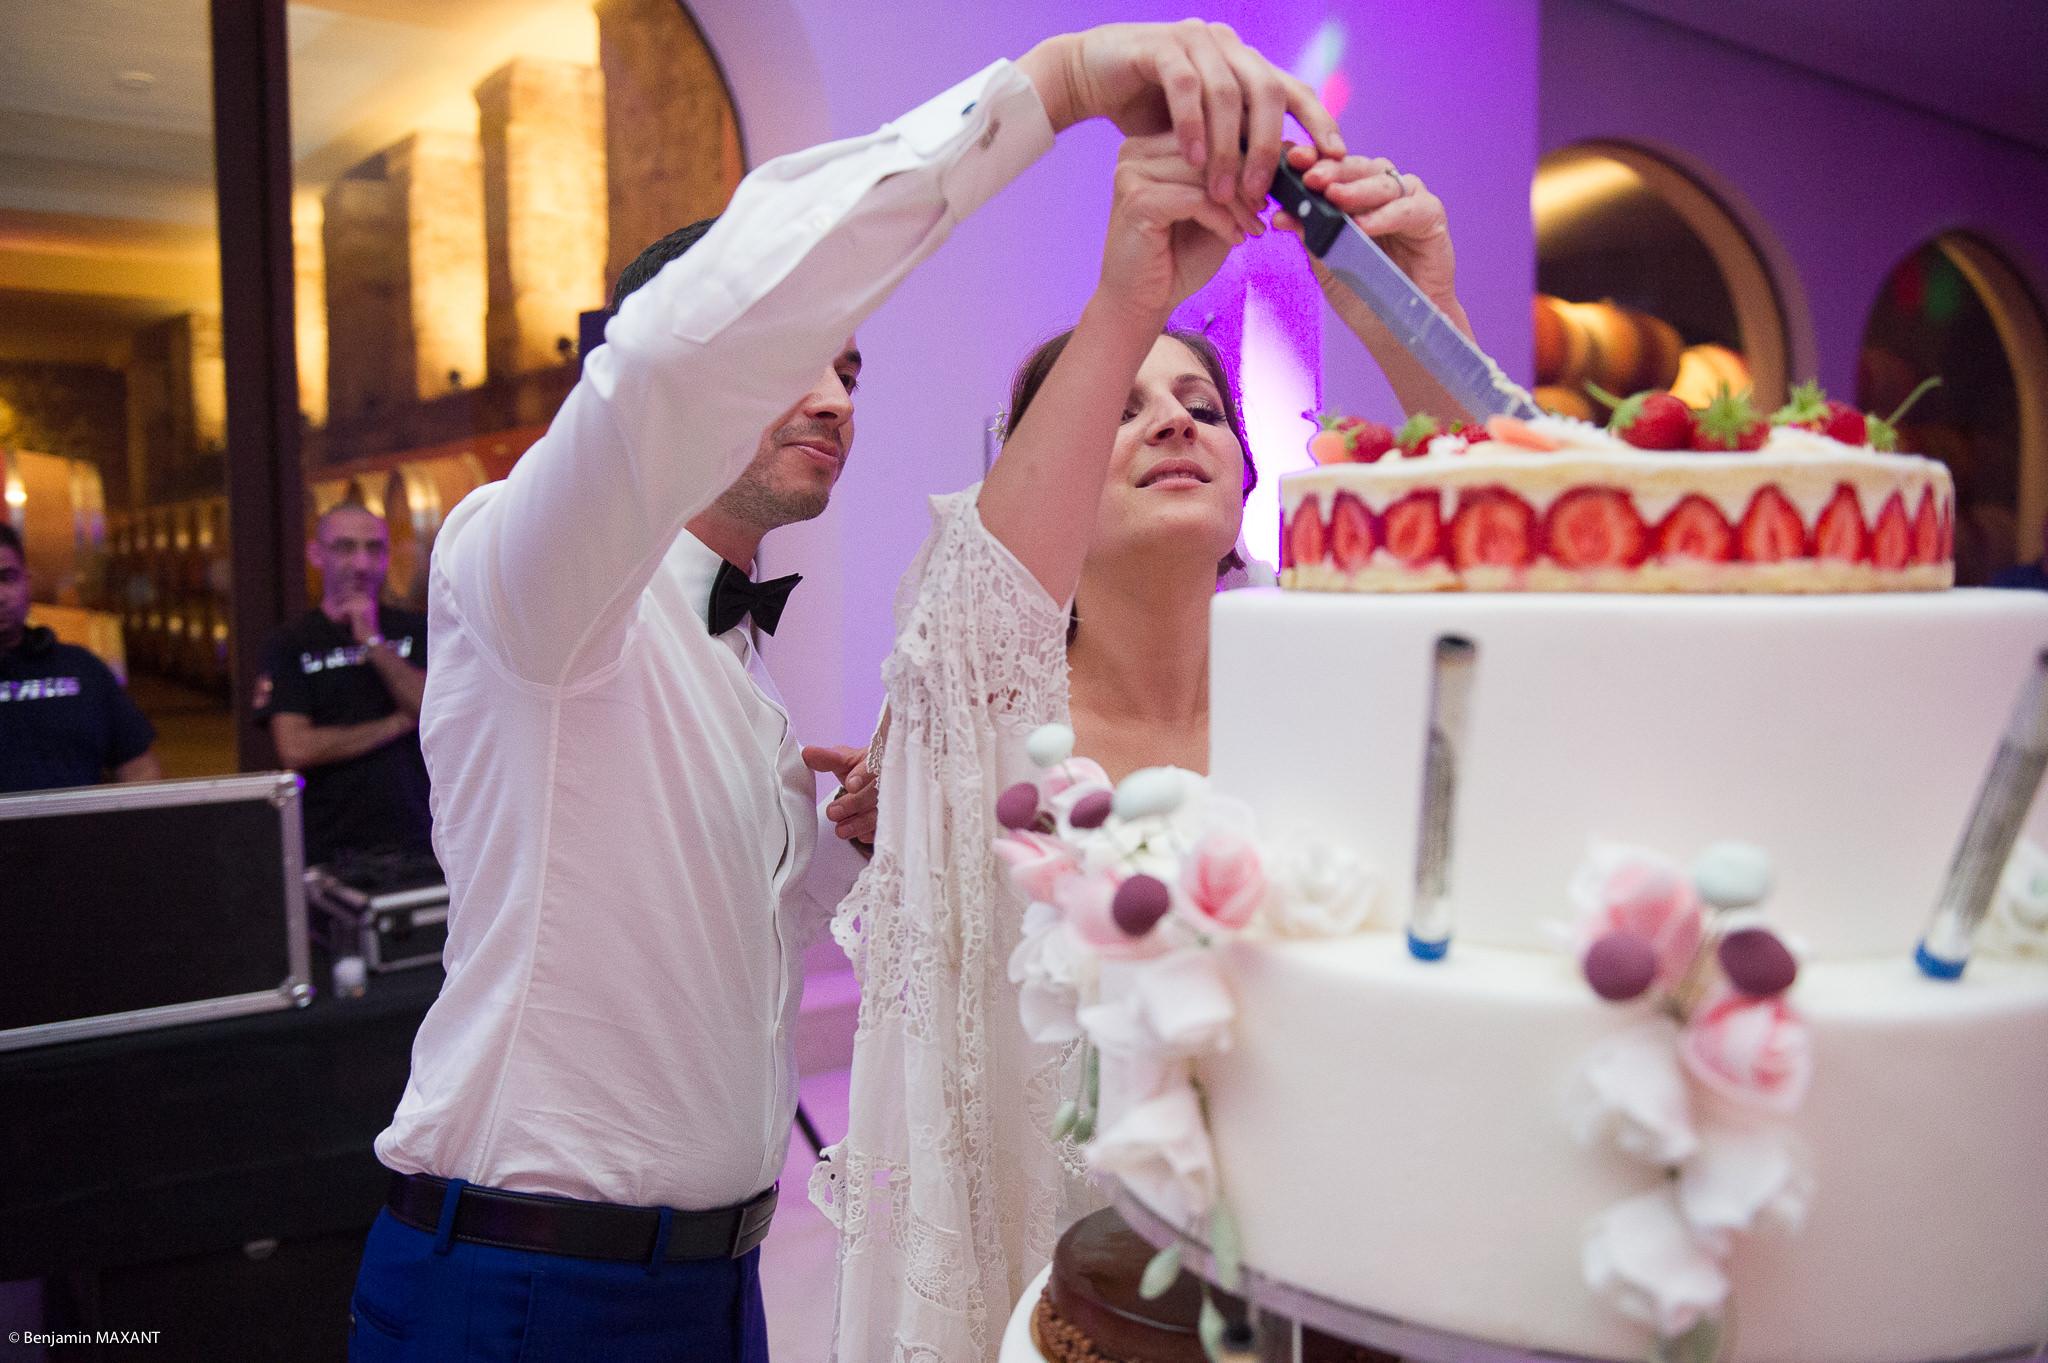 Married brides cut the set piece